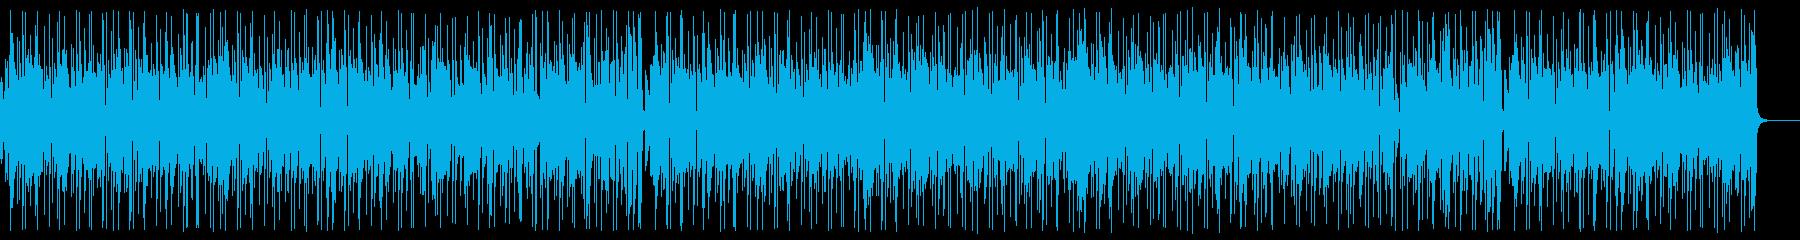 80's style light jazz pop's reproduced waveform